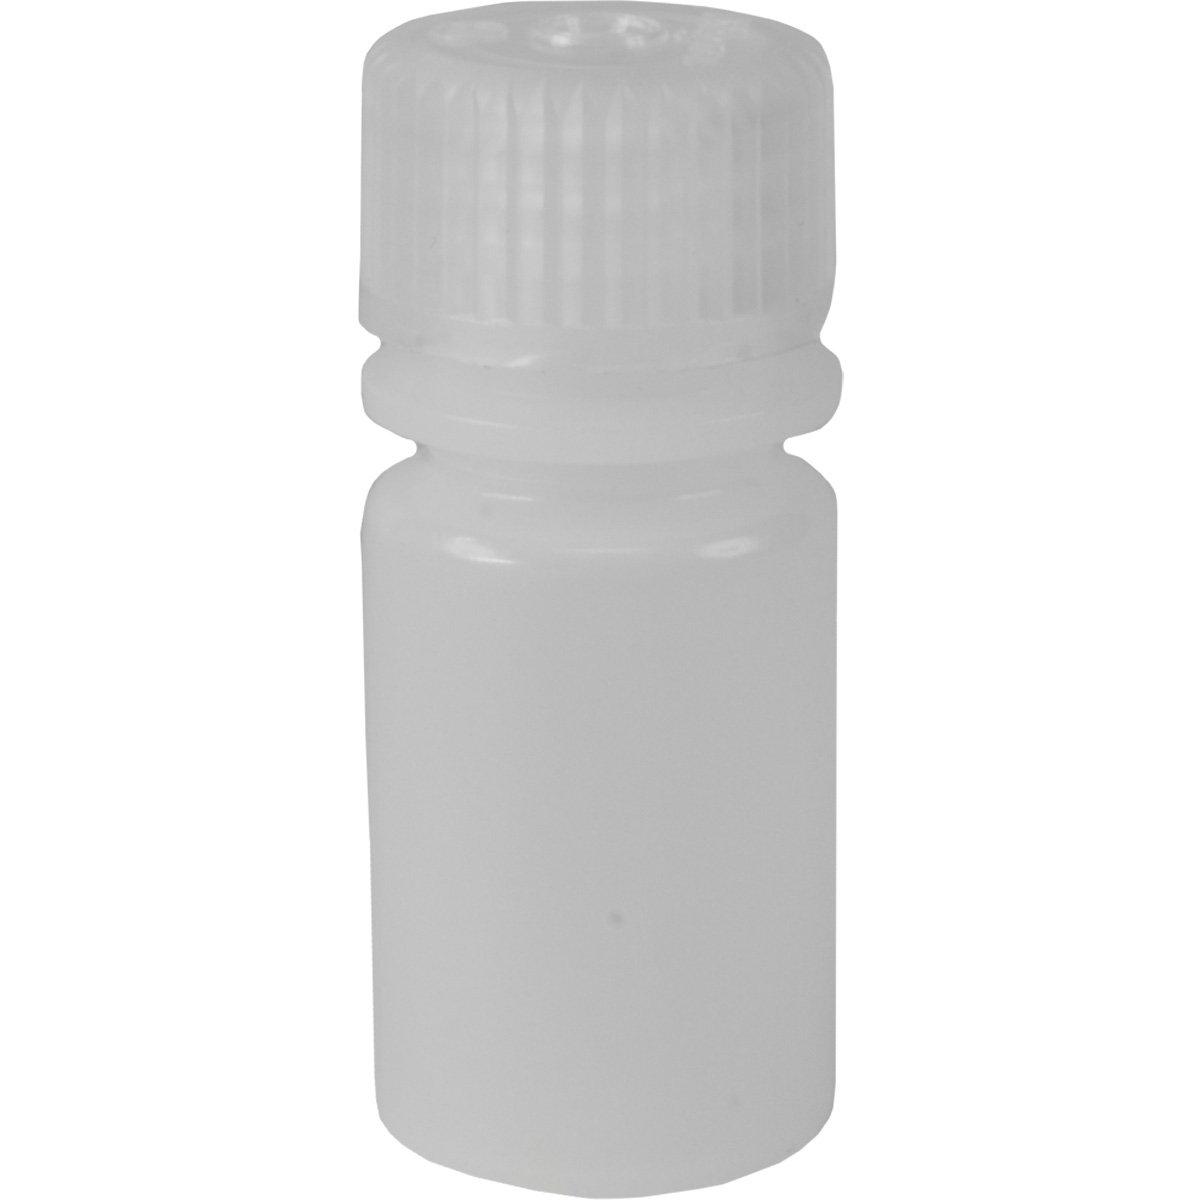 Nalgene Narrow Mouth Bottle (1/2-Ounce)